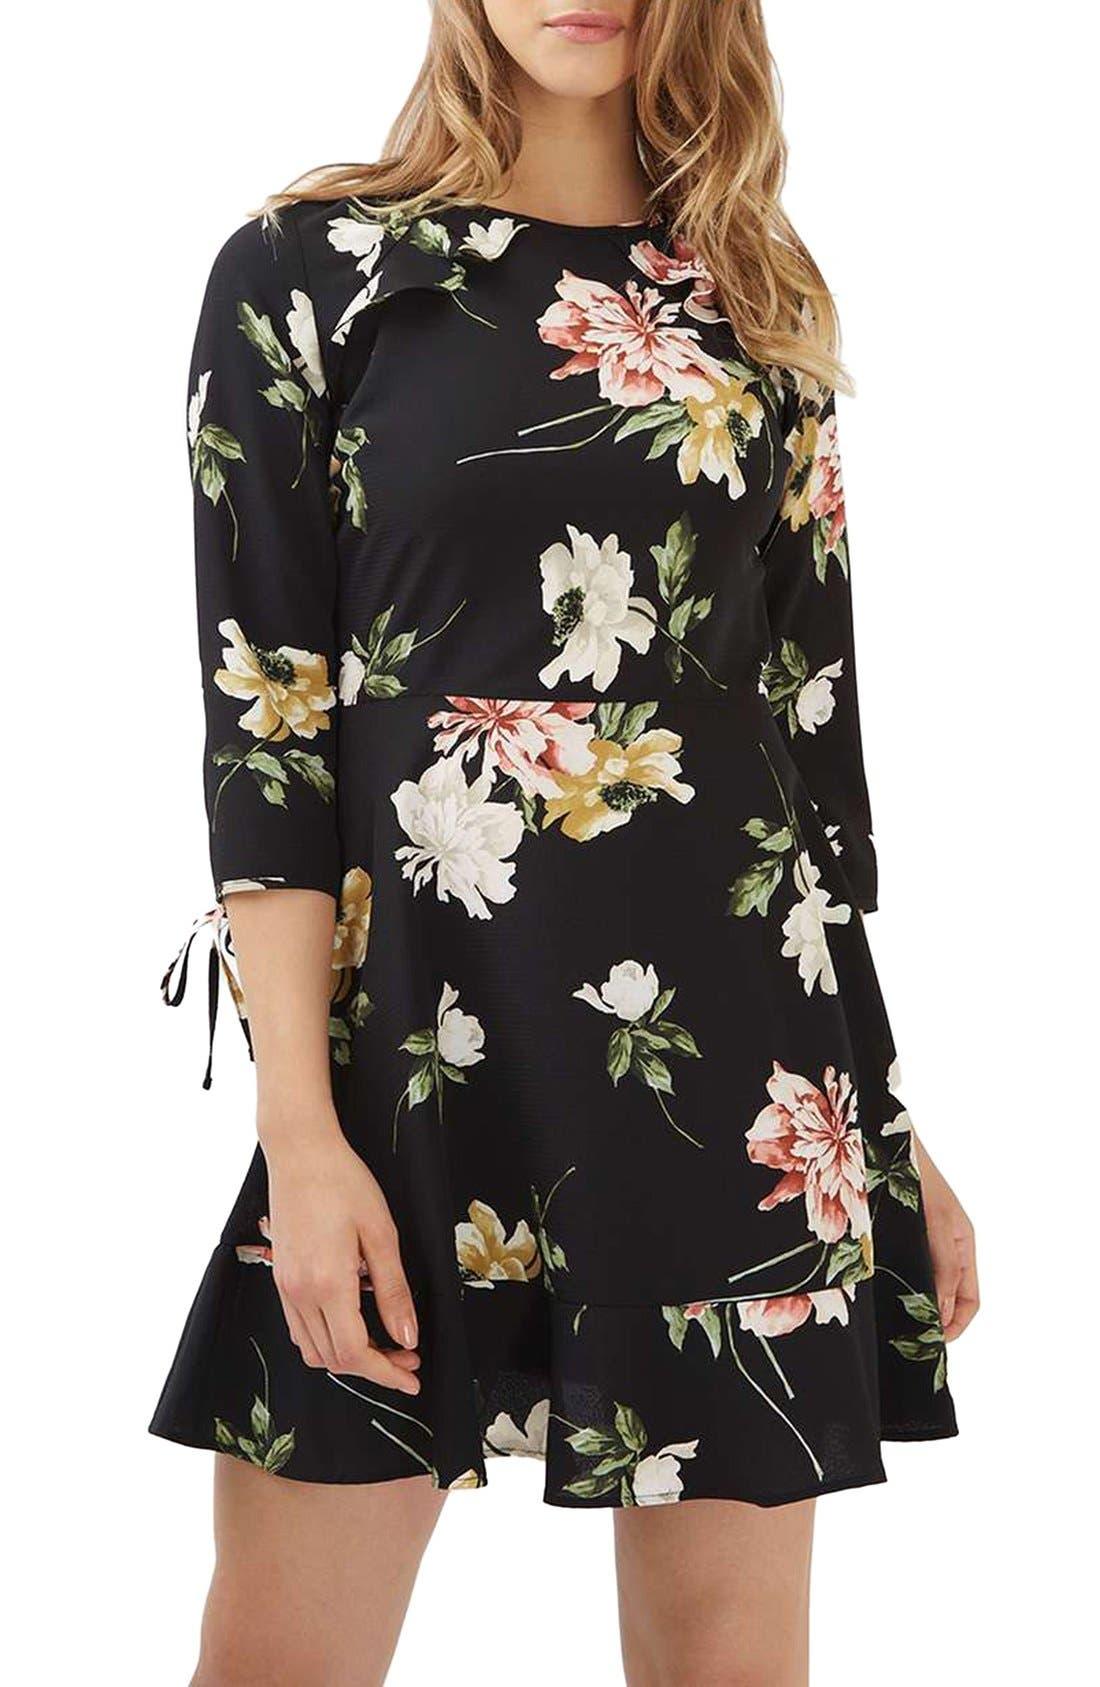 Ruffle Floral Tea Dress,                         Main,                         color, 001